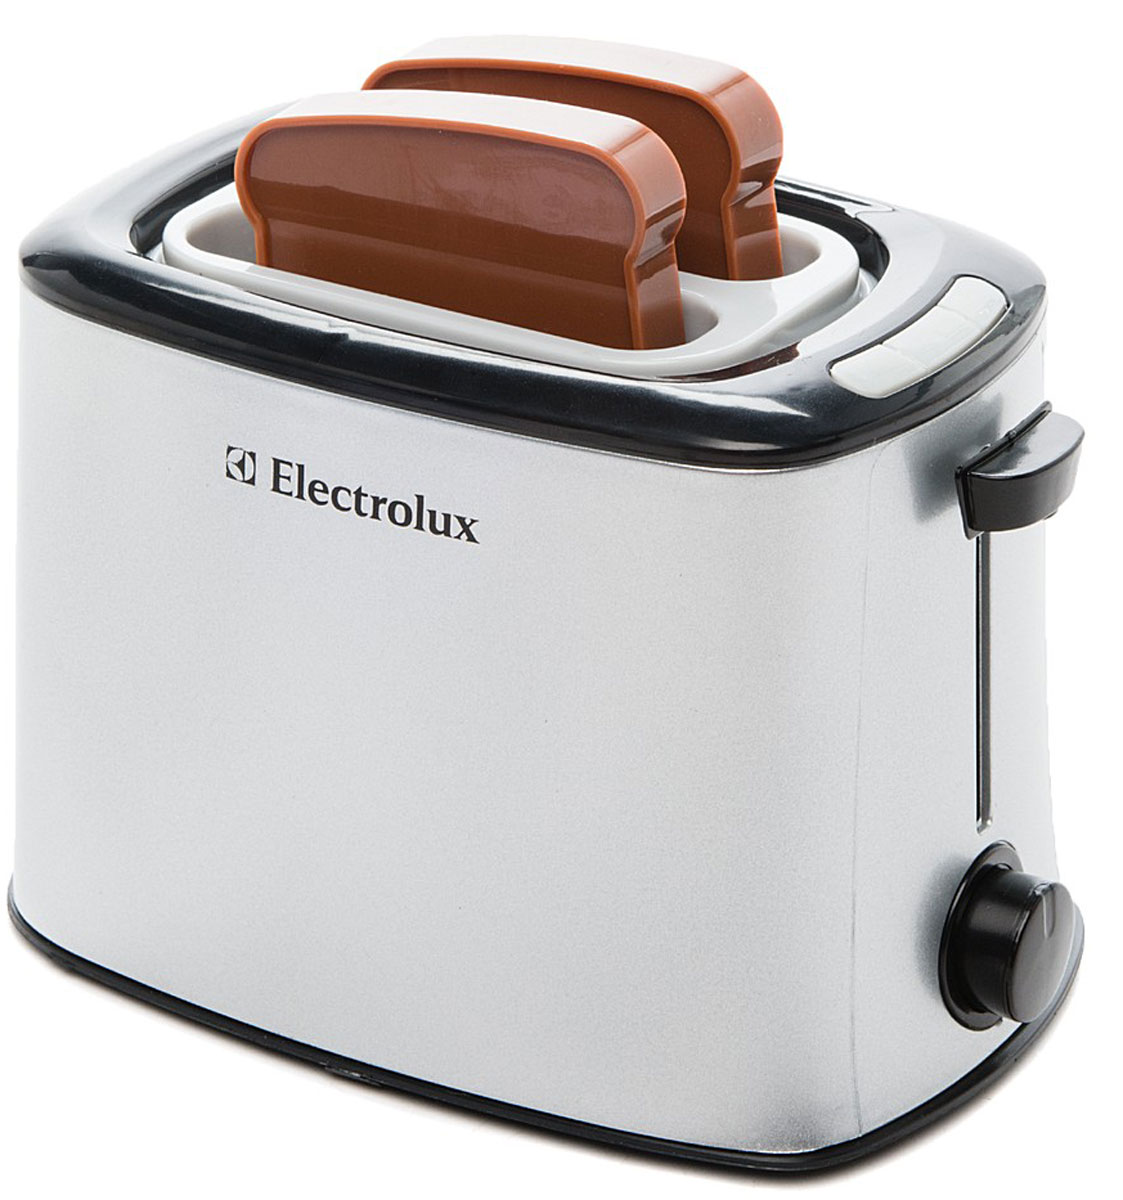 Klein Игровой набор Electrolux Тостер, Theo Klein GmbH